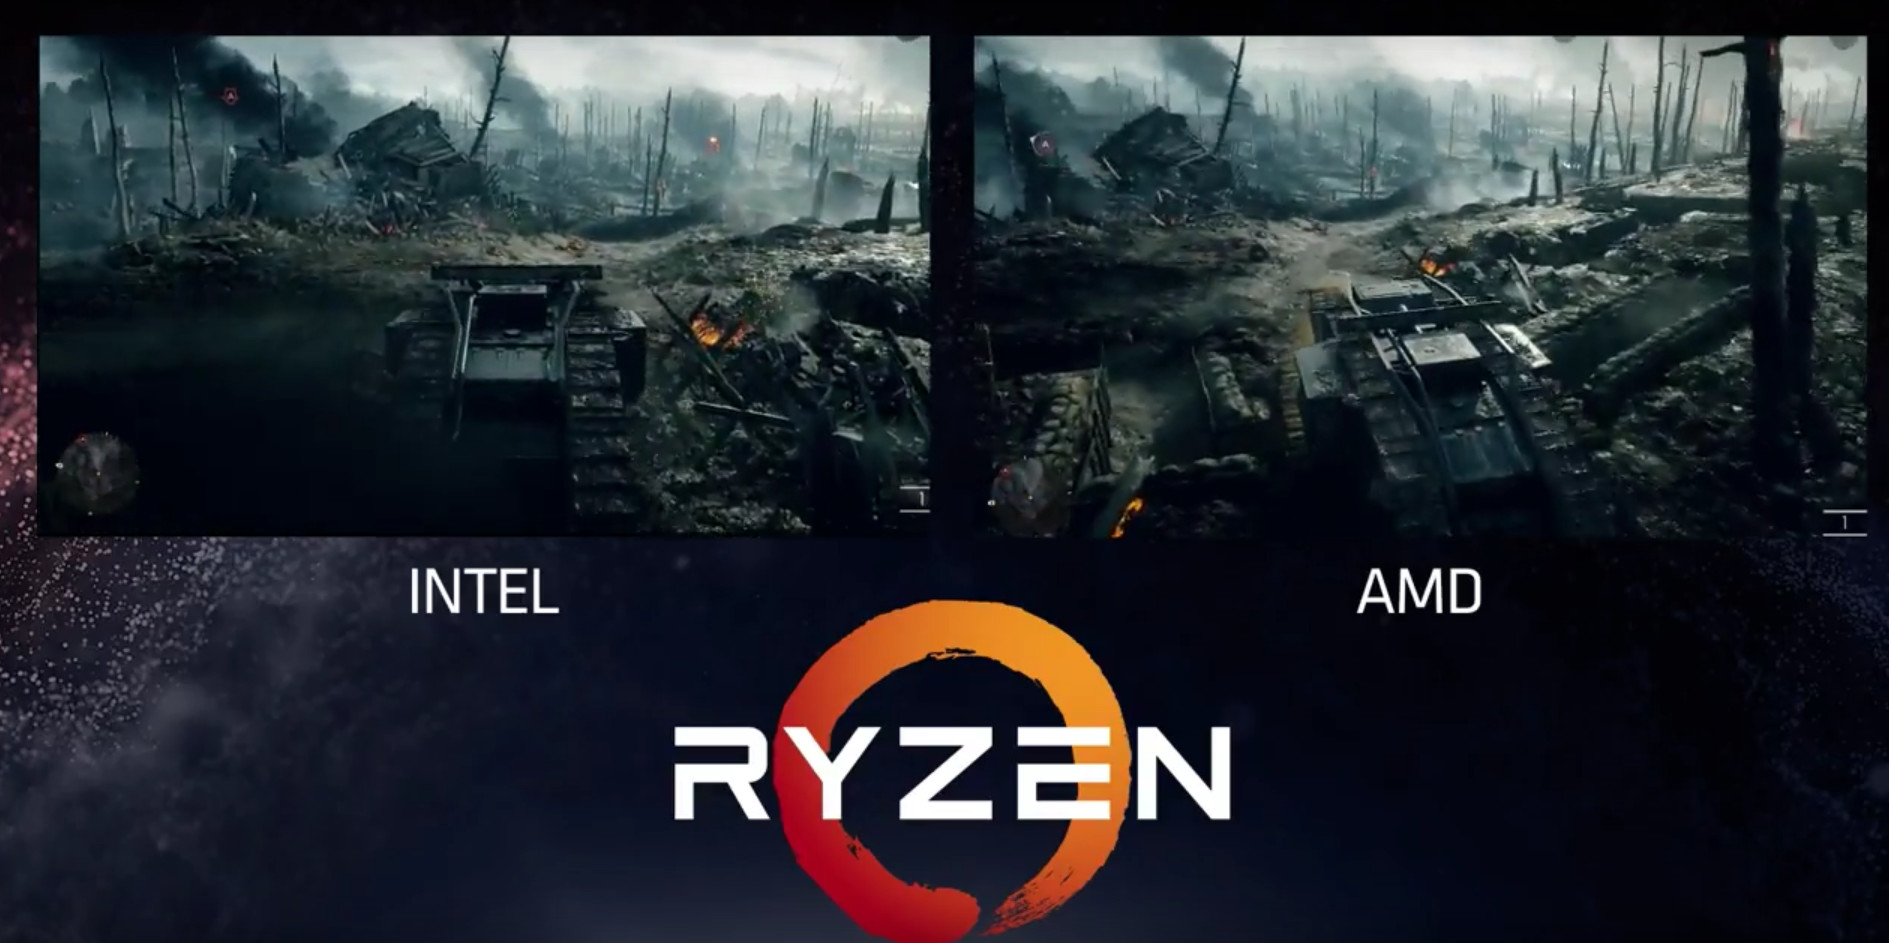 AMD RYZEN Demo Event - Beats $1,100 8-Core i7-6900K, With